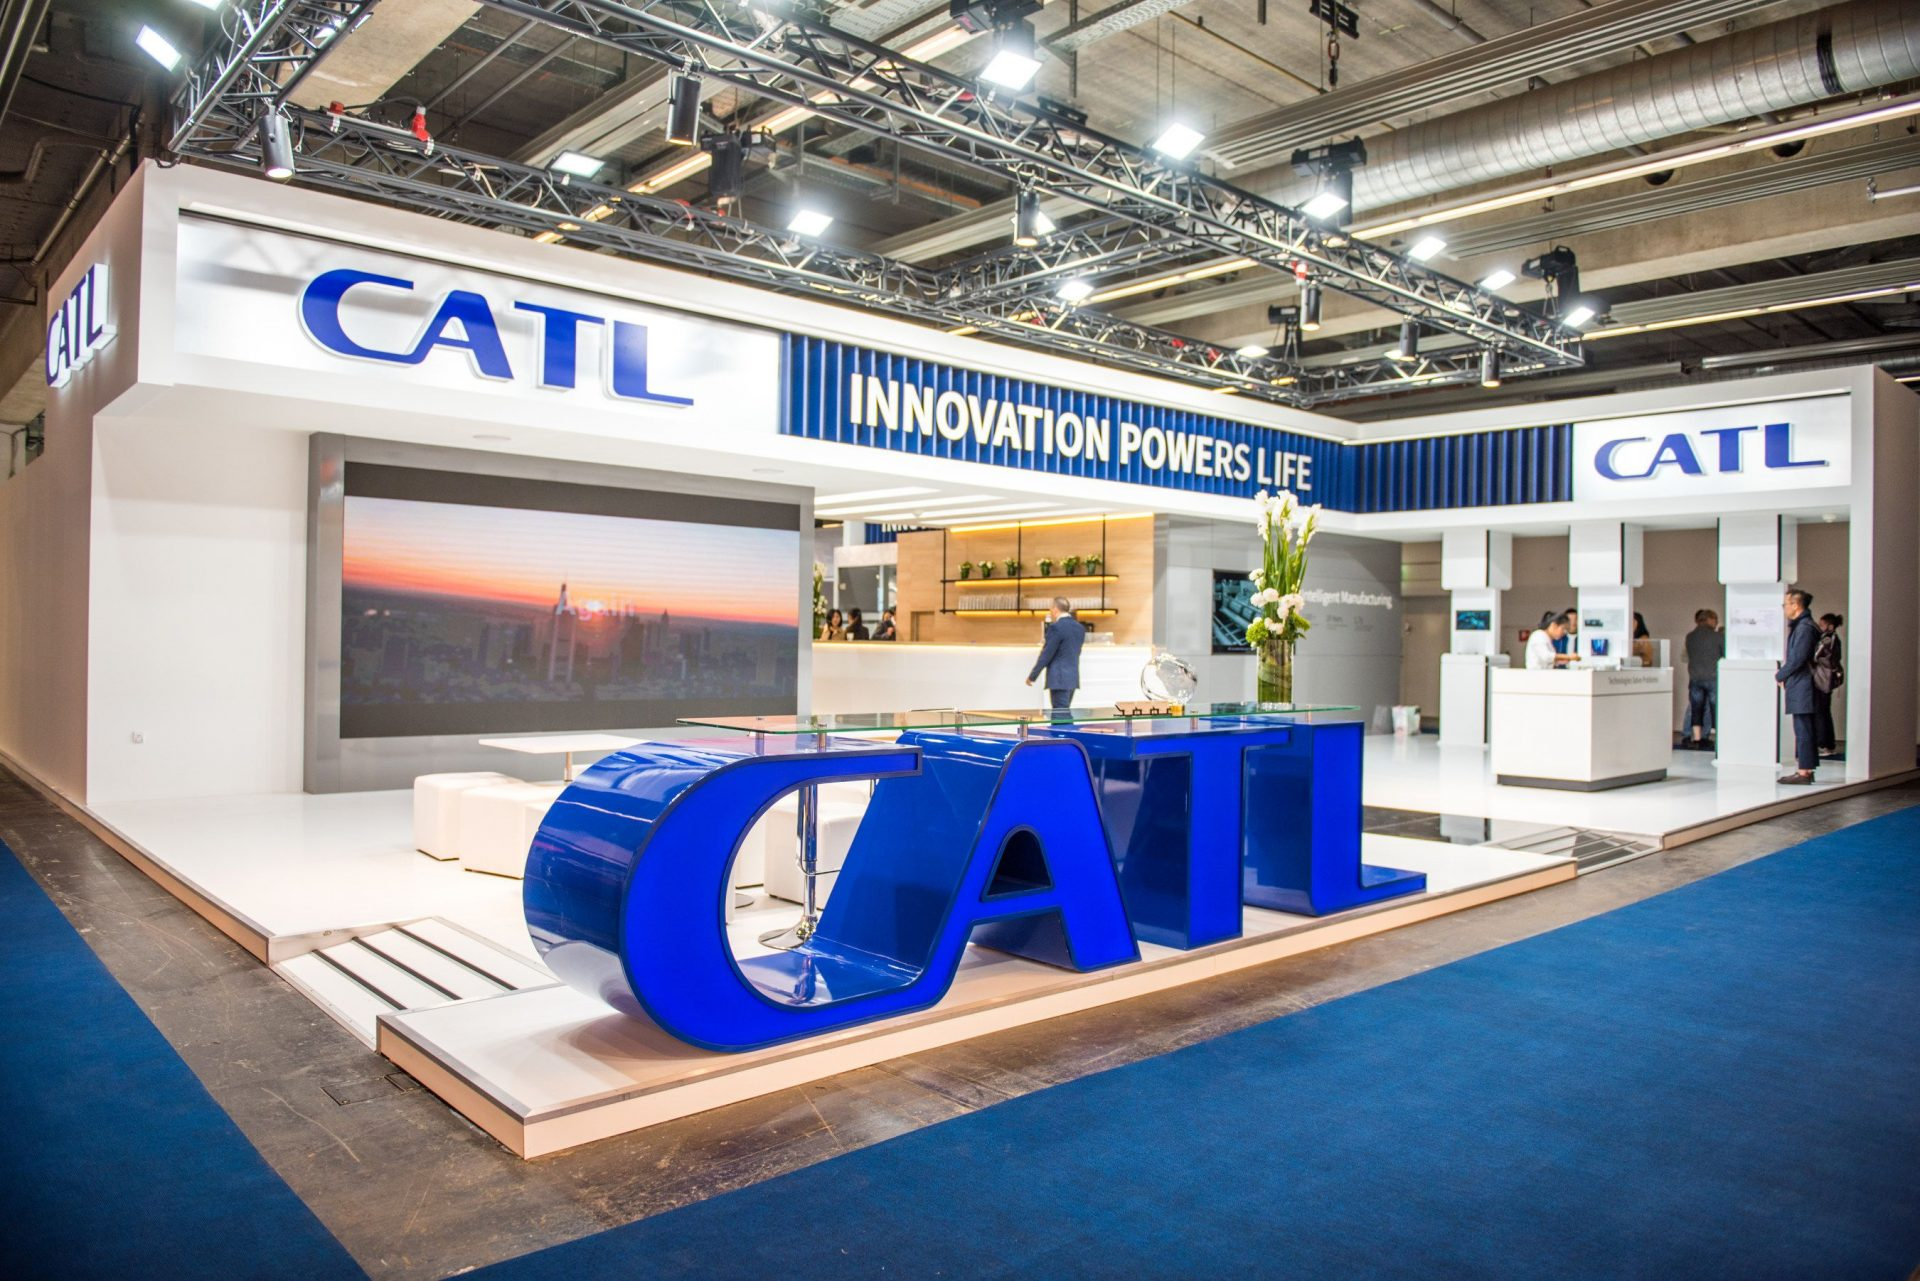 garantia 16 ani baterie CATL bateria de 2 milioane km